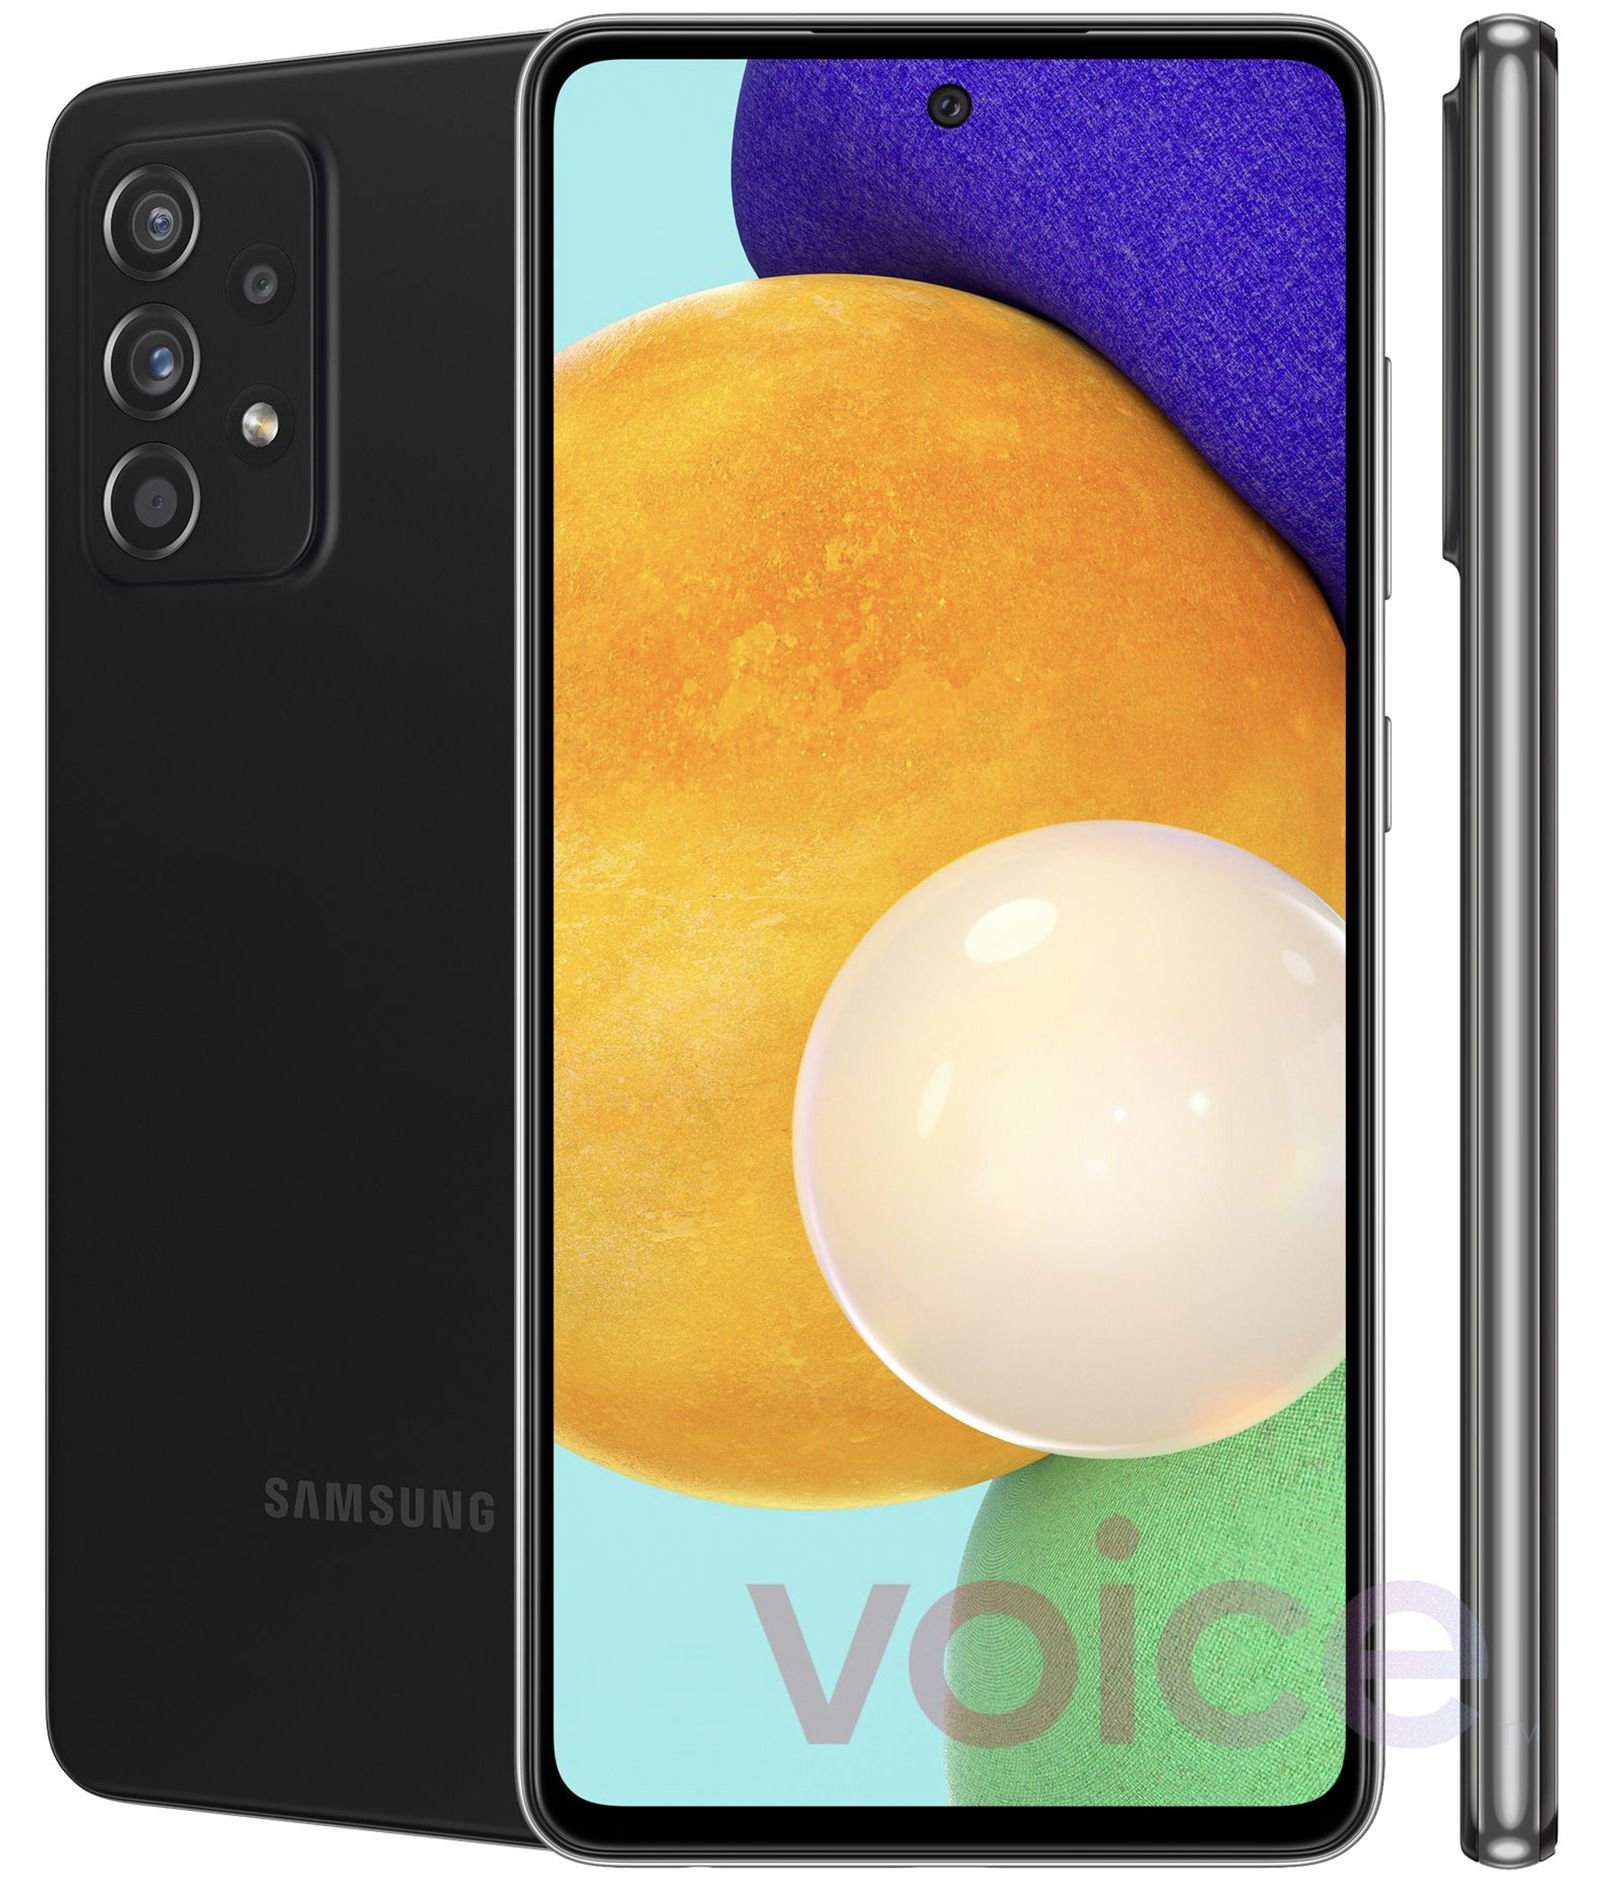 Samsung Galaxy A52 5G leaked press image | Source: Evan Blass